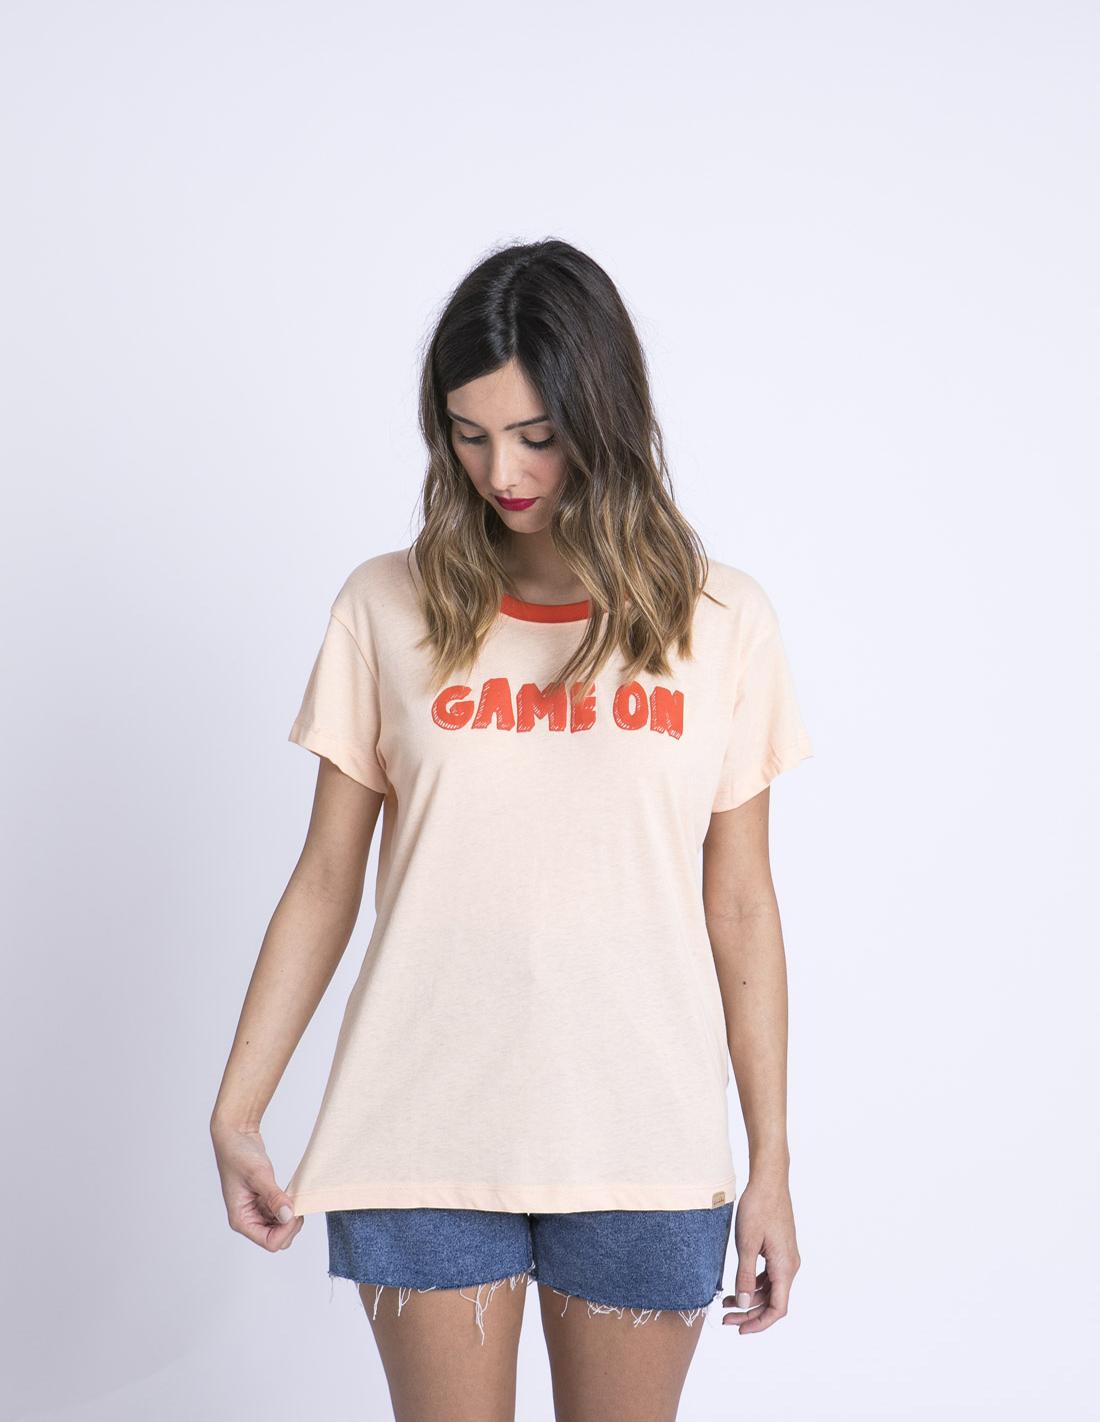 Cómo anudar tus camisetas y camisas Sommes Demode